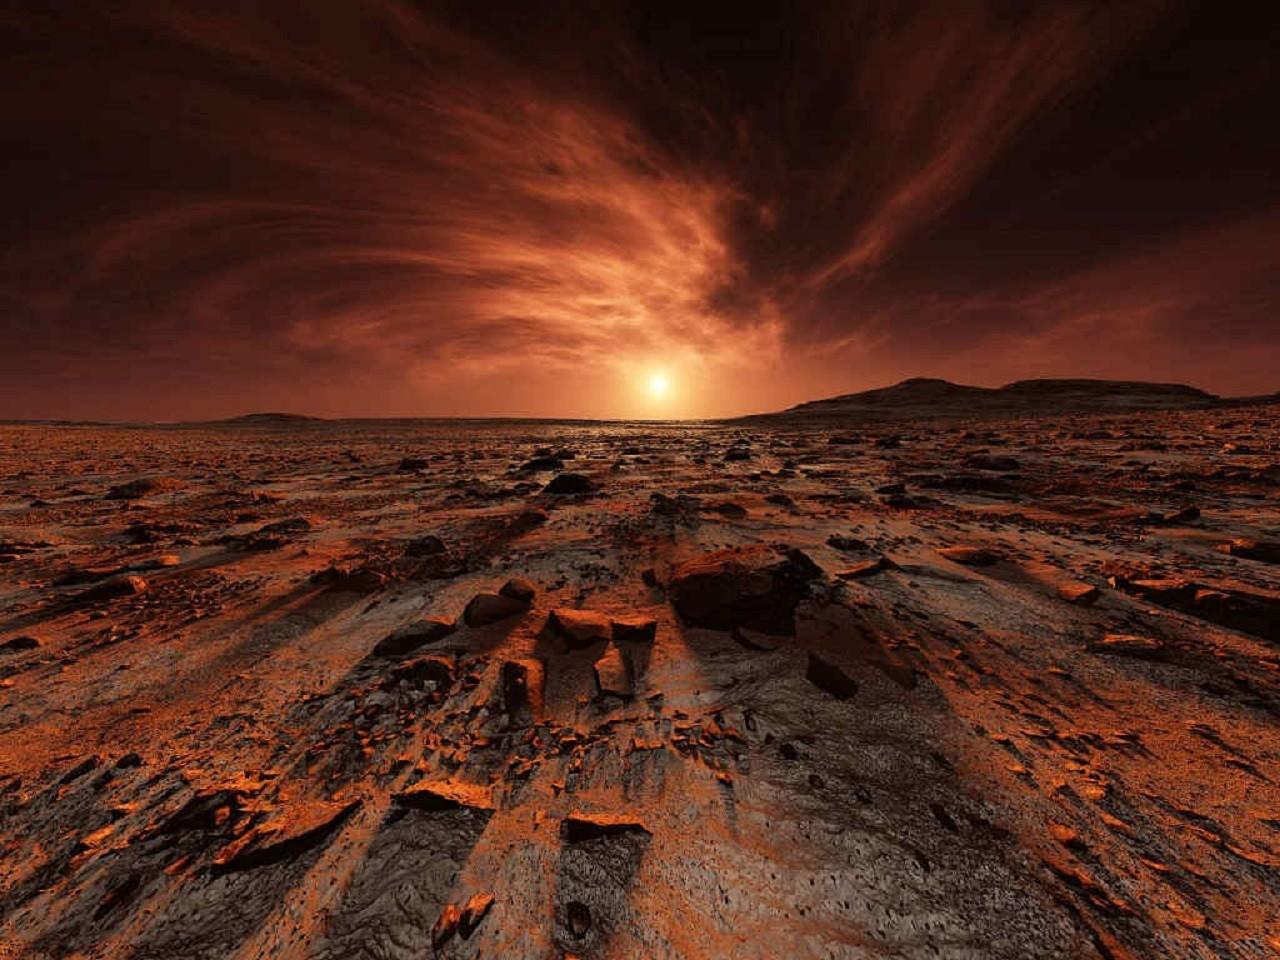 Ученые: земные бактерии адаптированы кжизни наМарсе